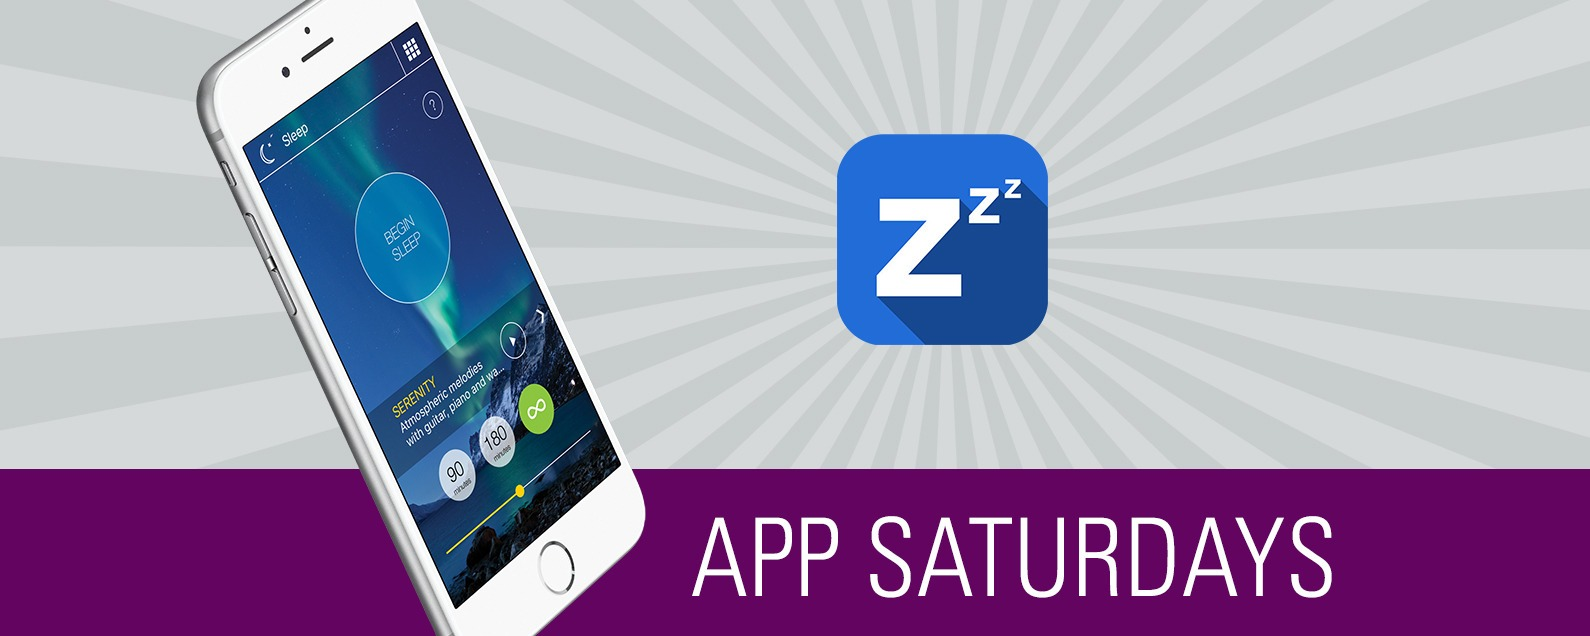 Can't Sleep? The Sleep Genius App Is Here to Help